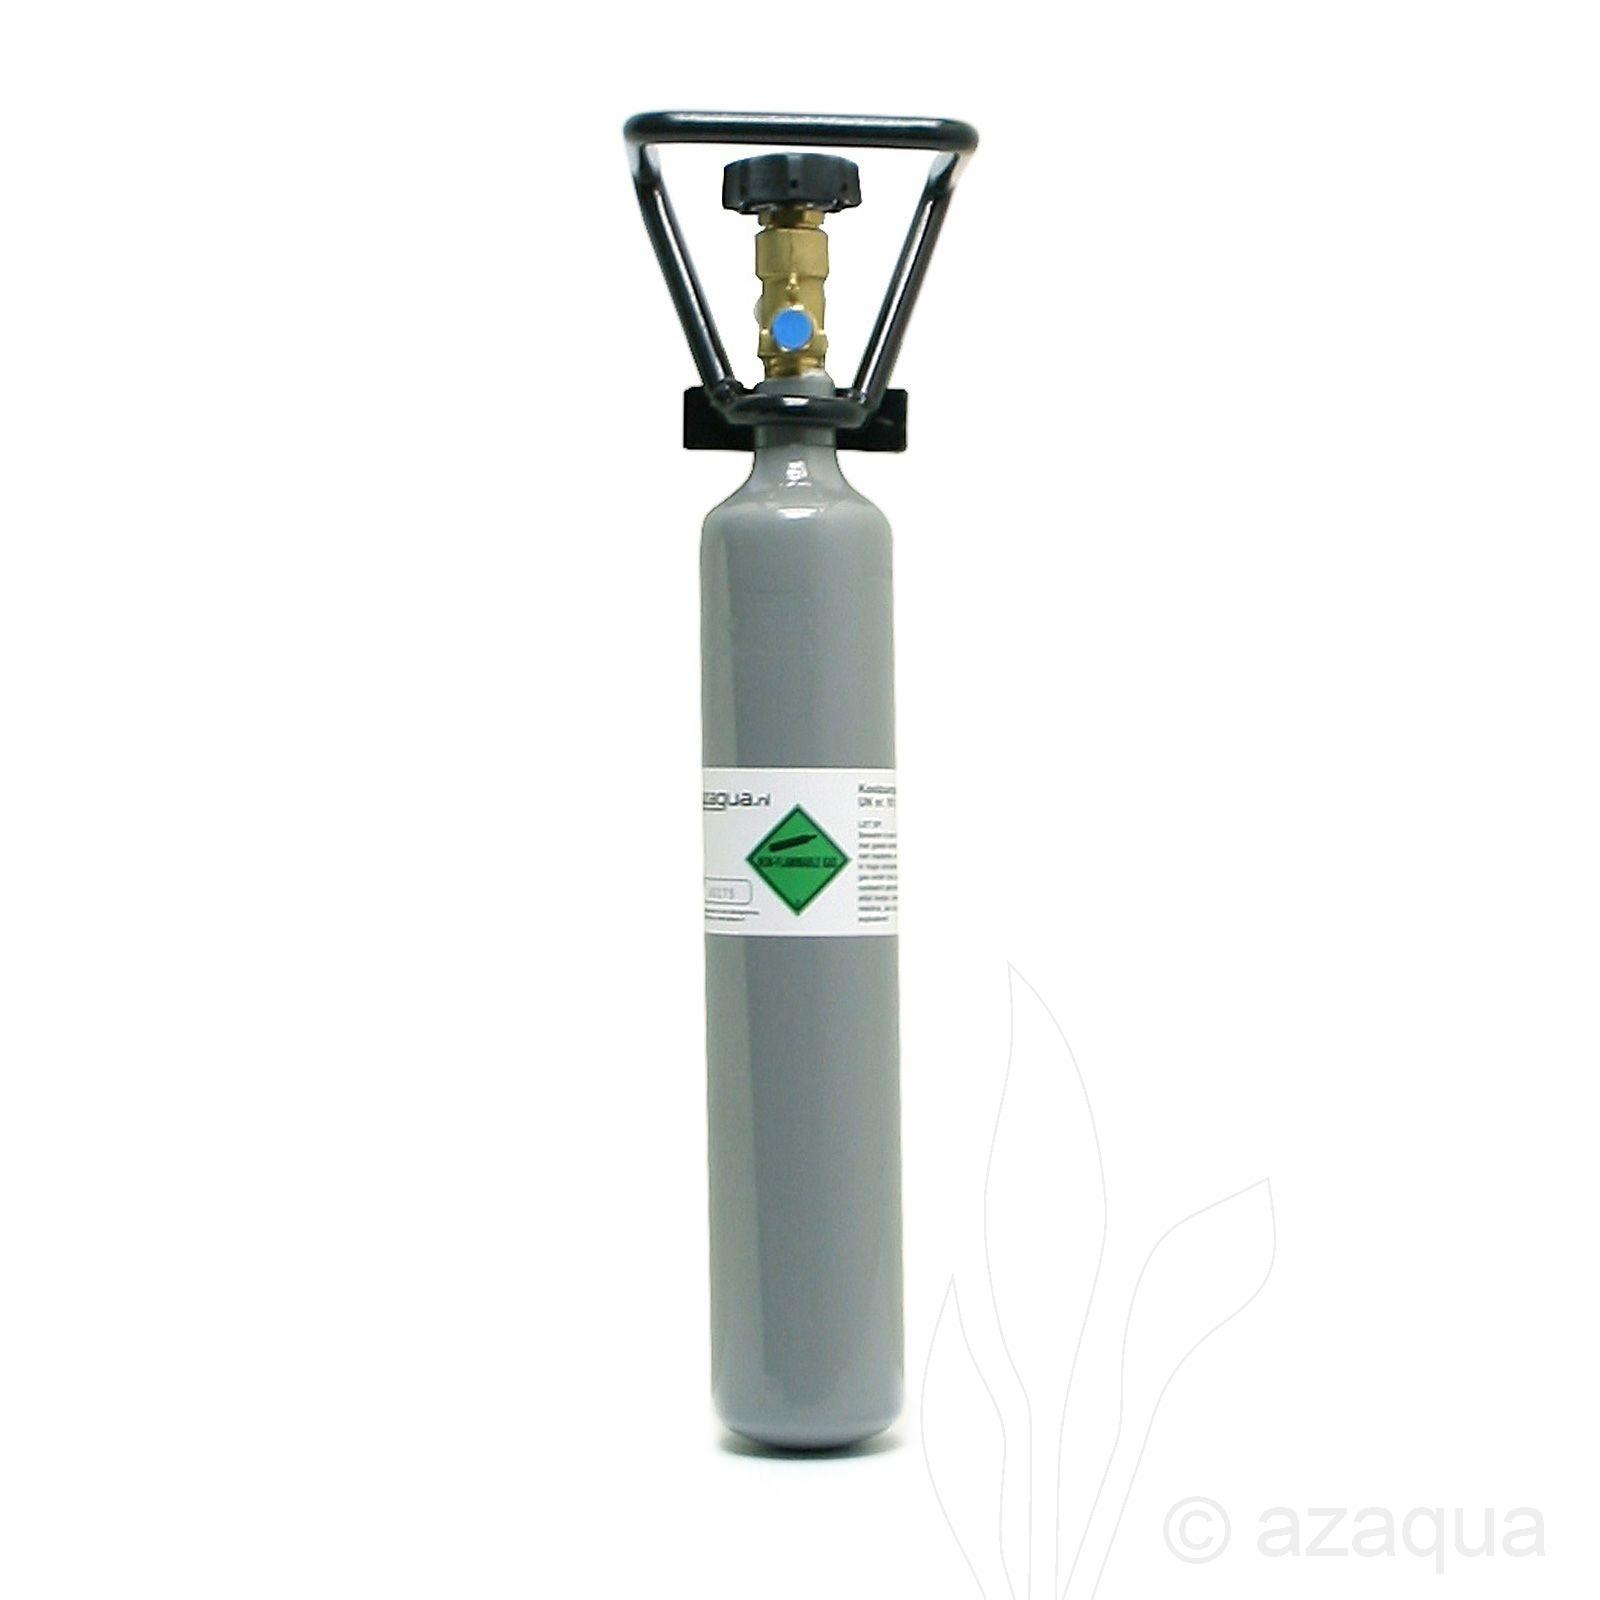 CO2 bottle refilled